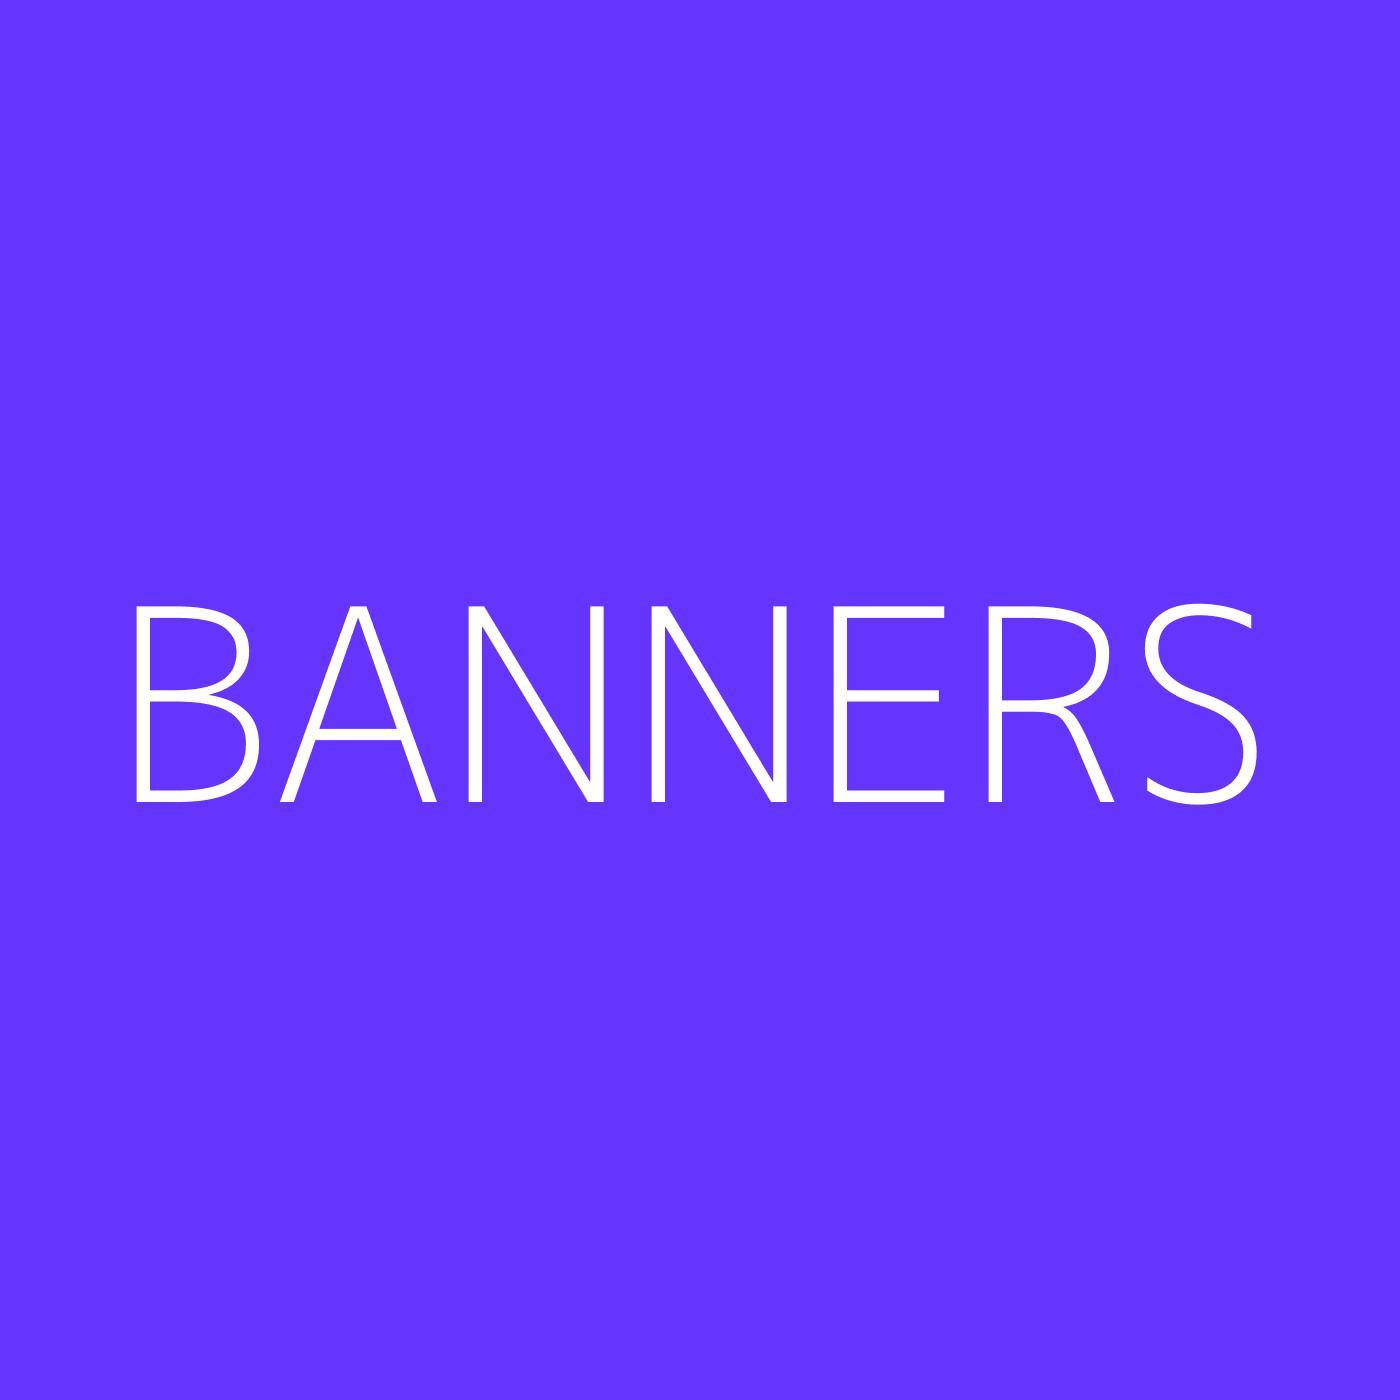 BANNERS Playlist Artwork